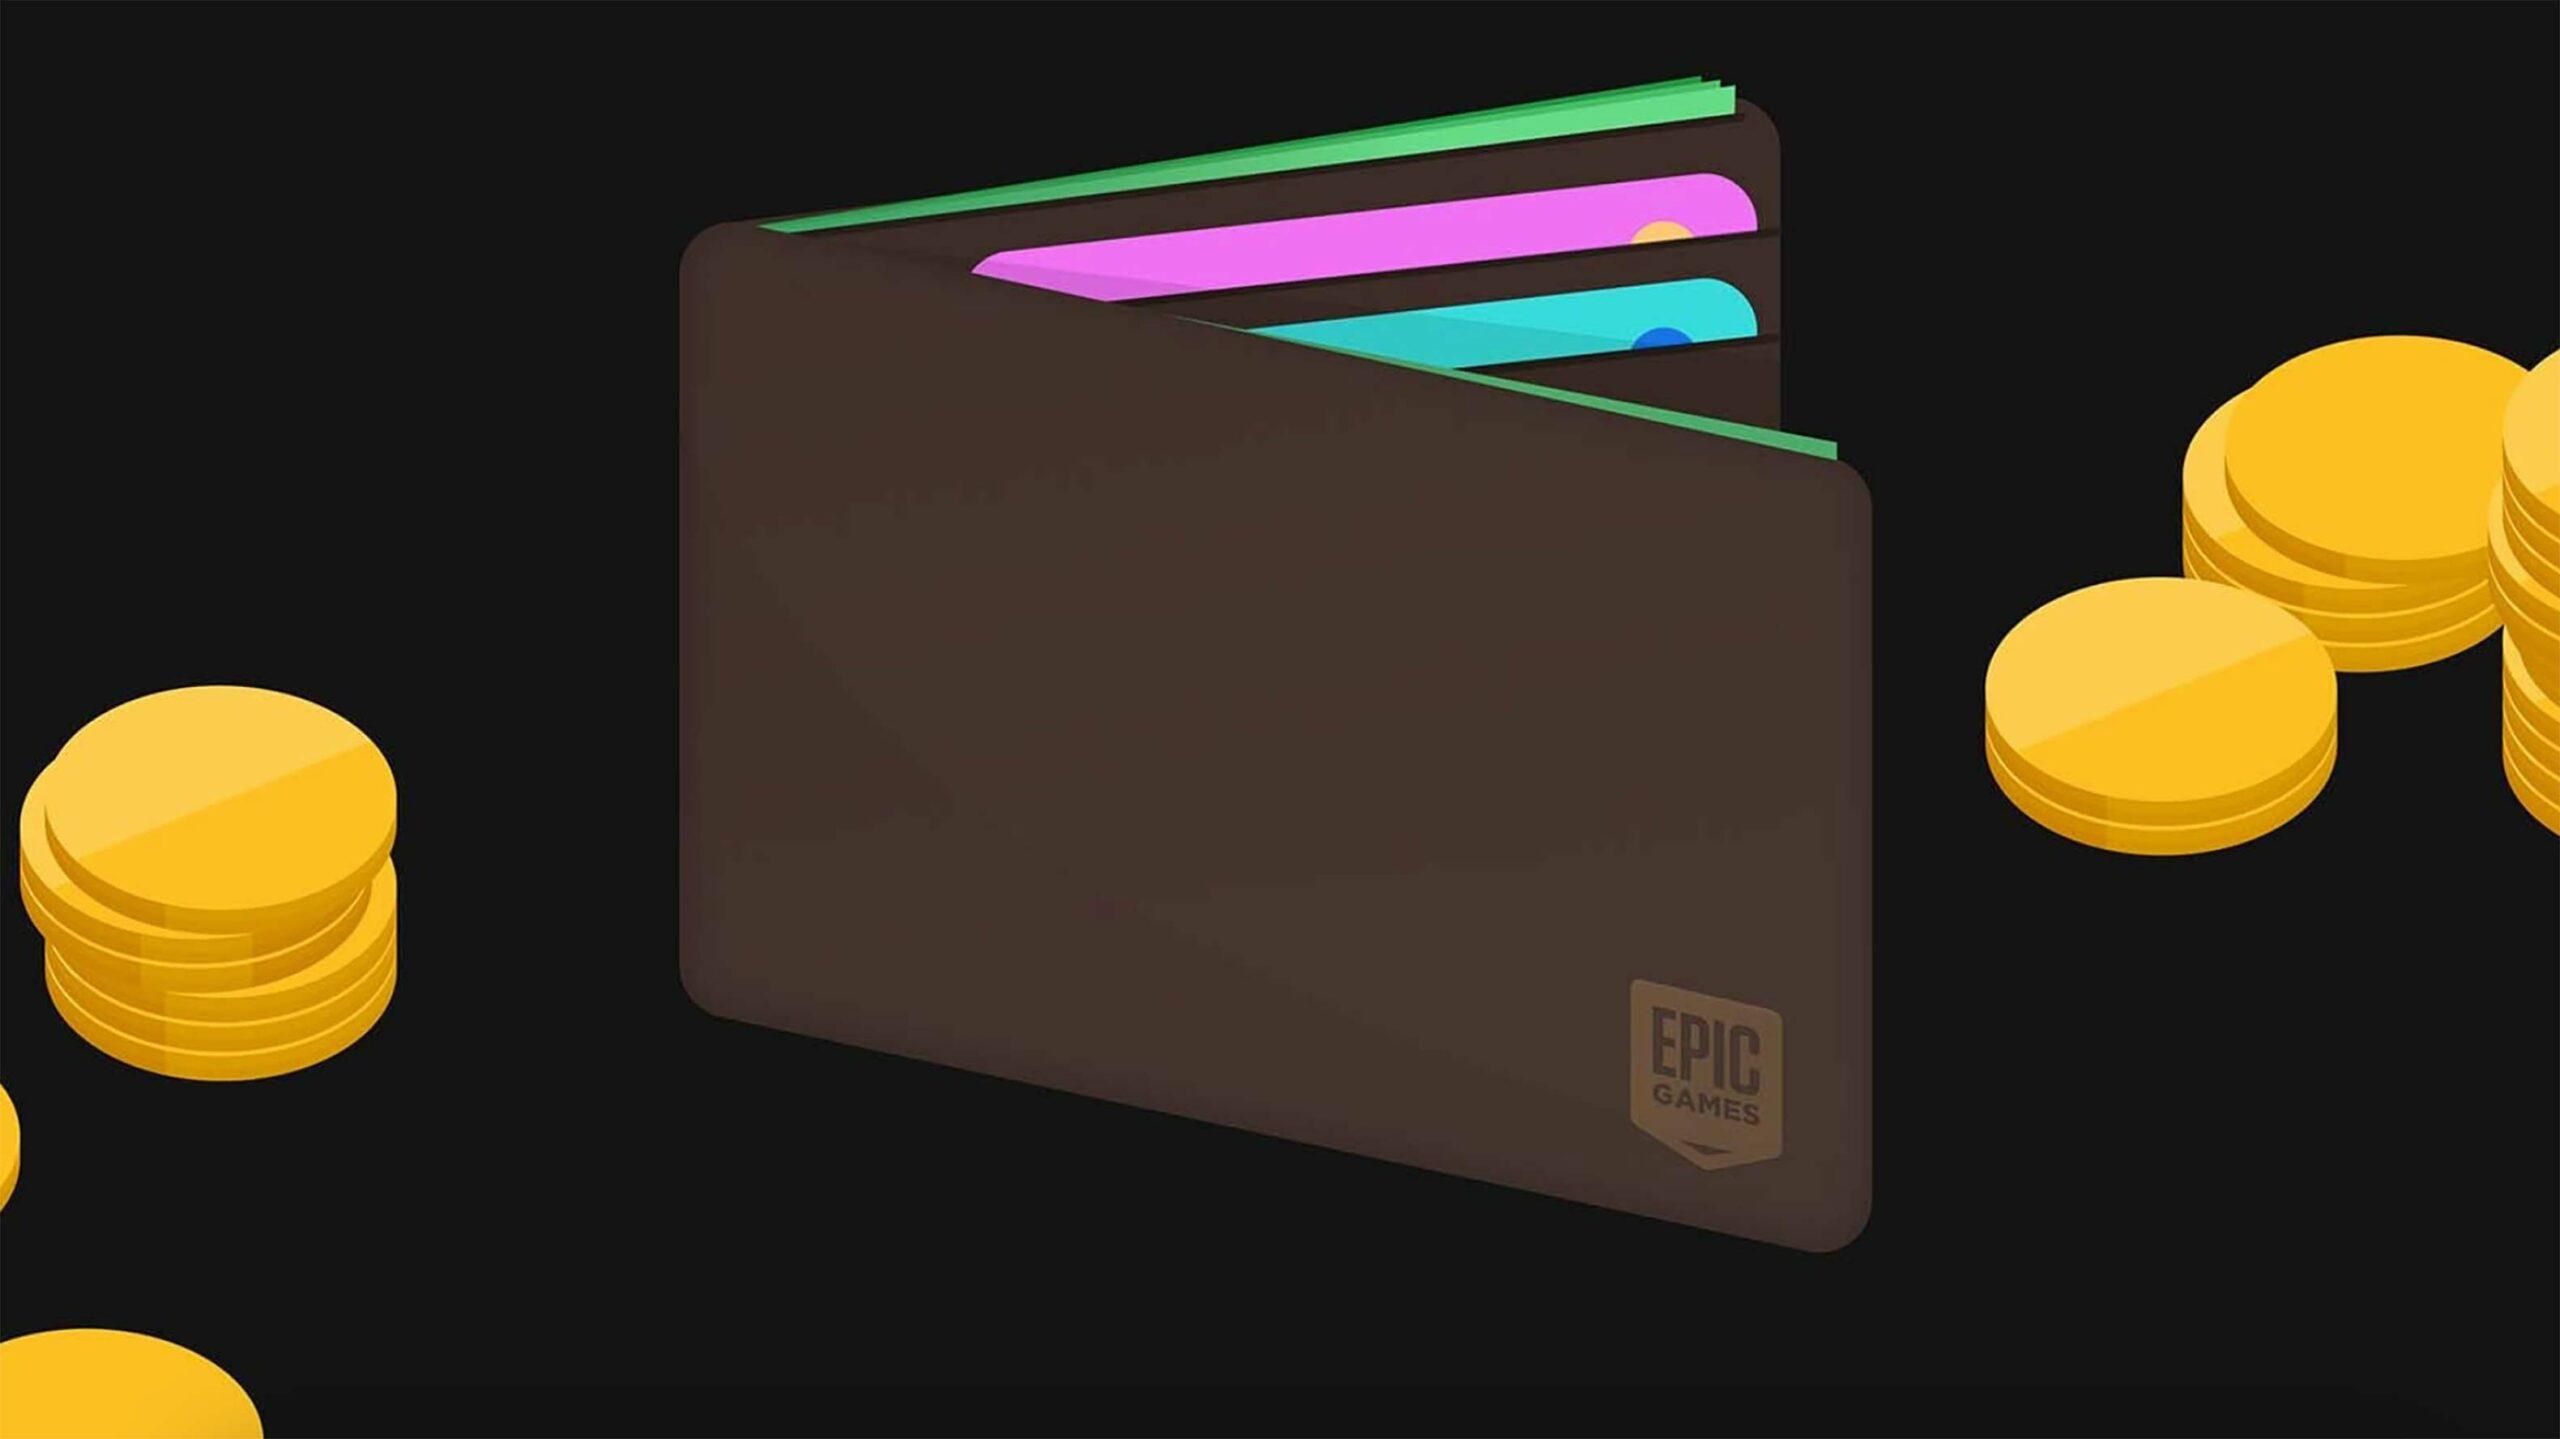 Epic Games Wallet